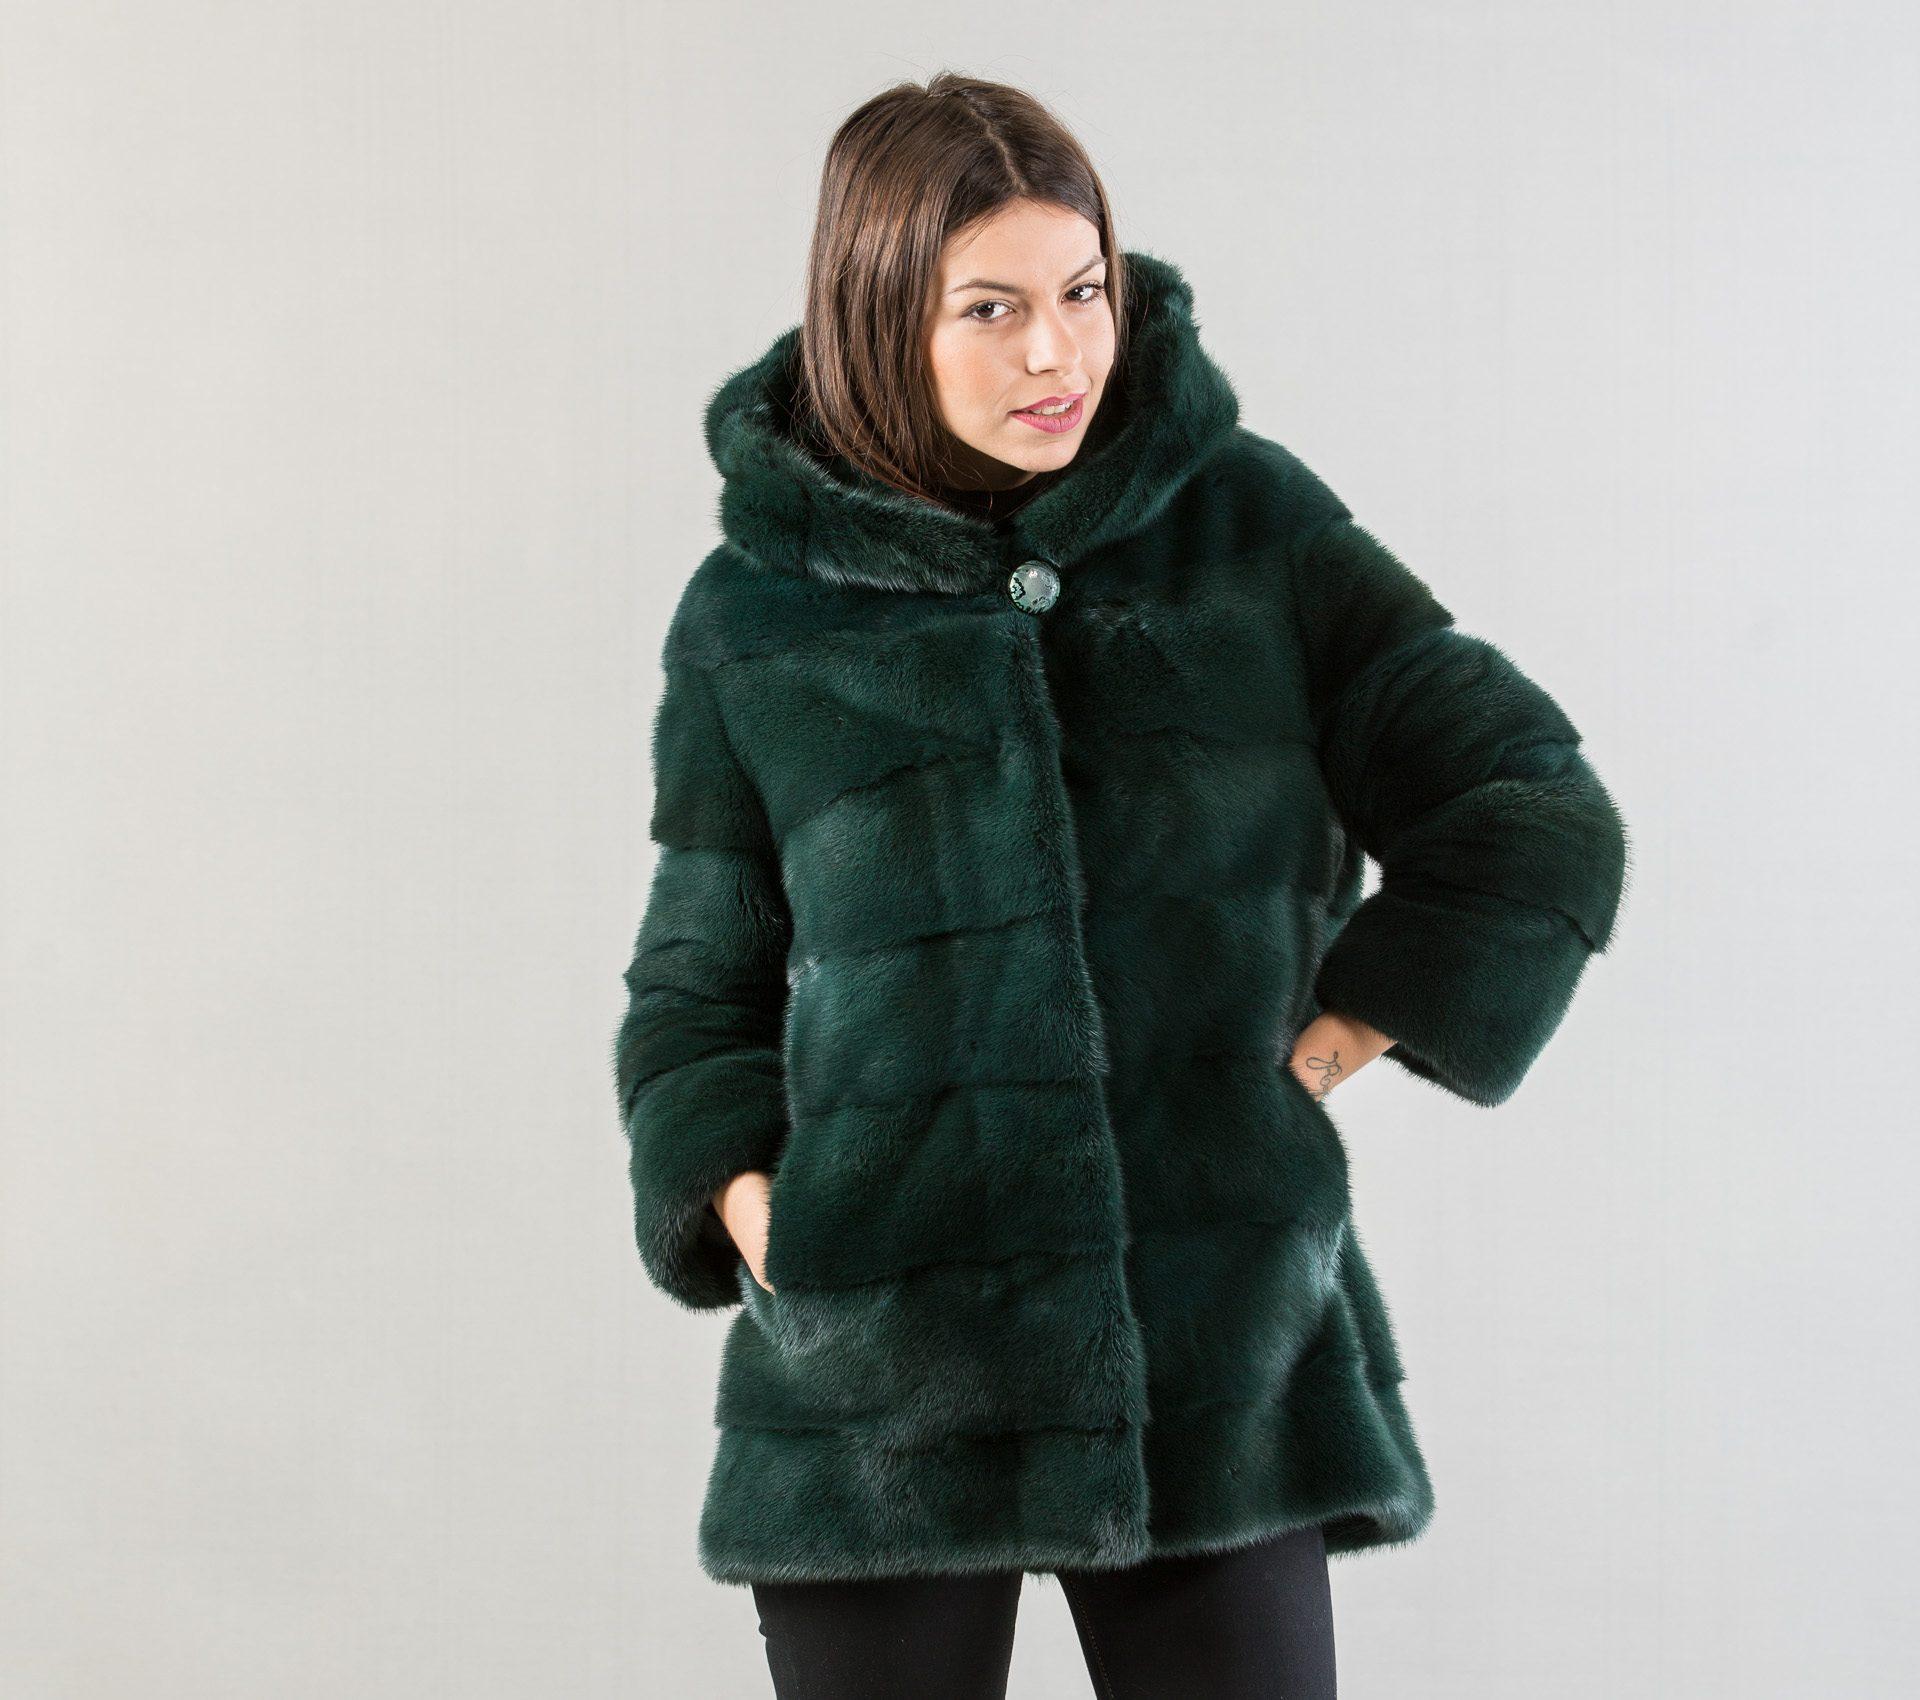 Dark Green Mink Fur Jacket . 100% Real Fur Coats and Accessories.